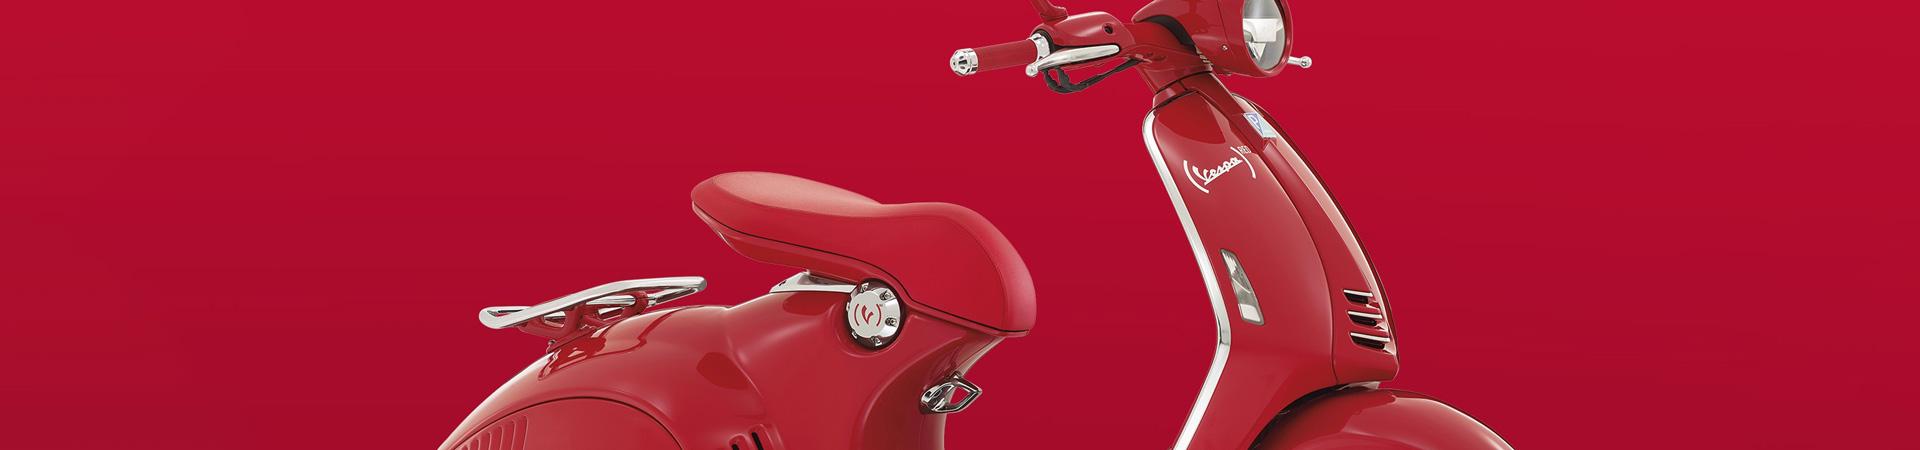 Renting motos para empresas